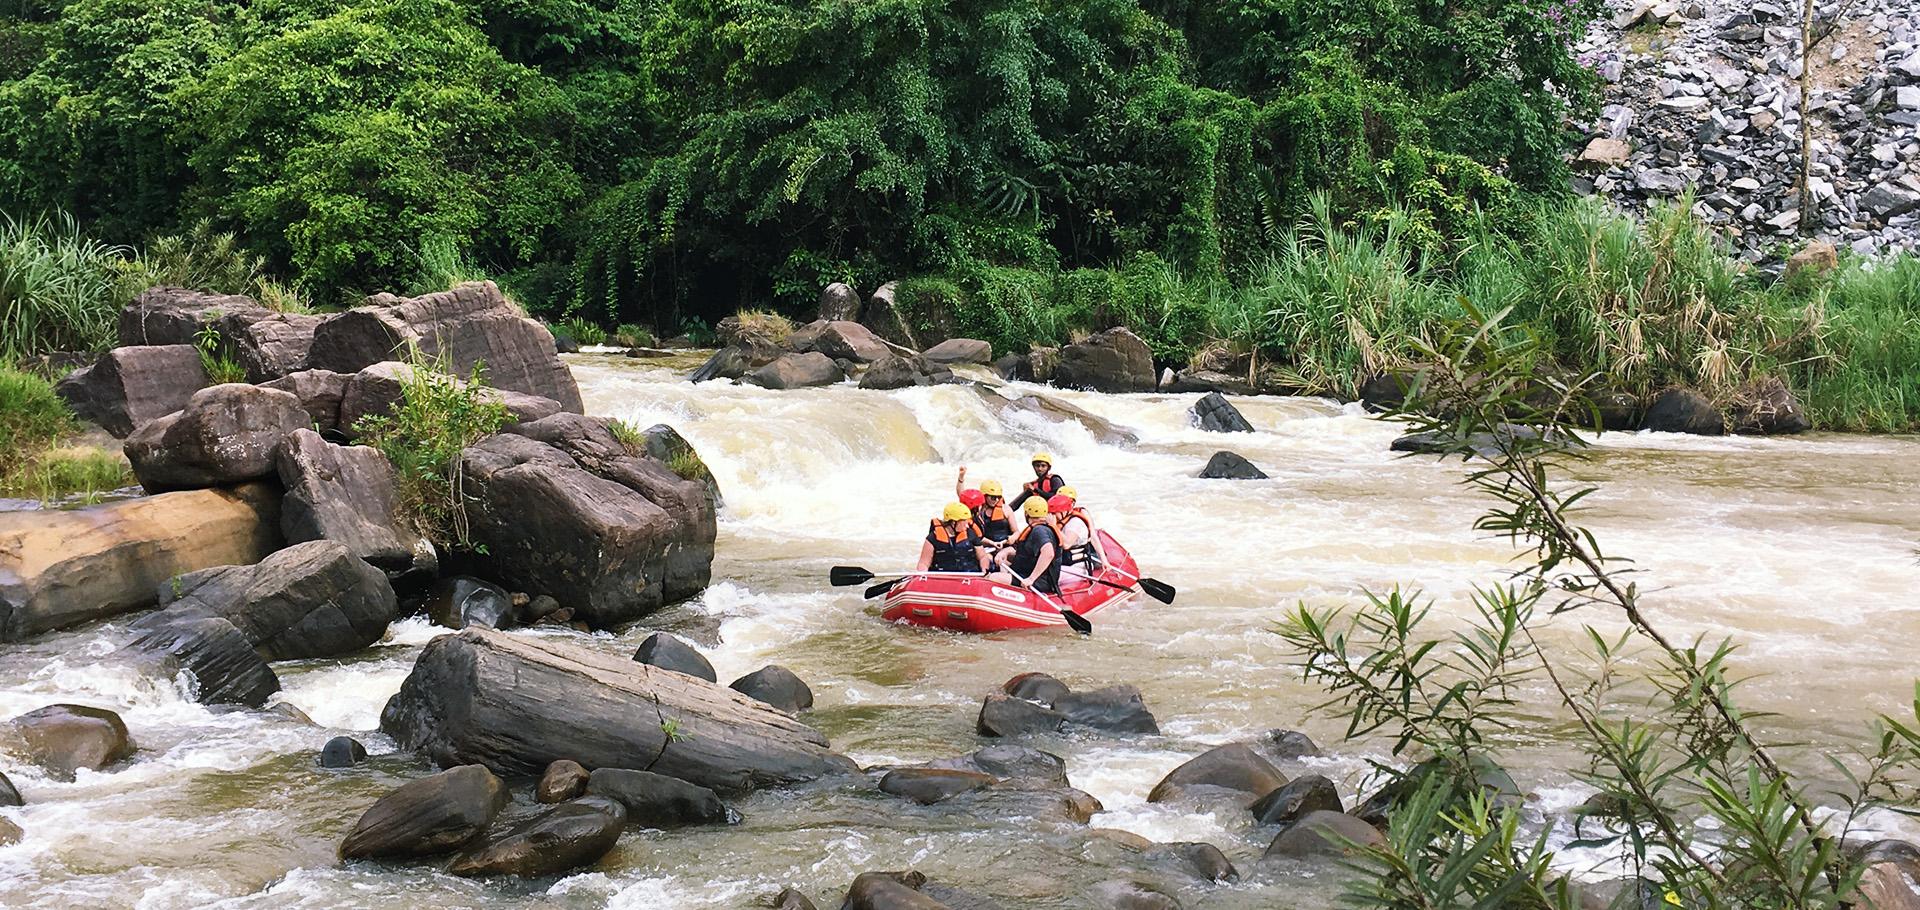 Sri Lanka Adventure (rafting) - wyjazd nagrodowy